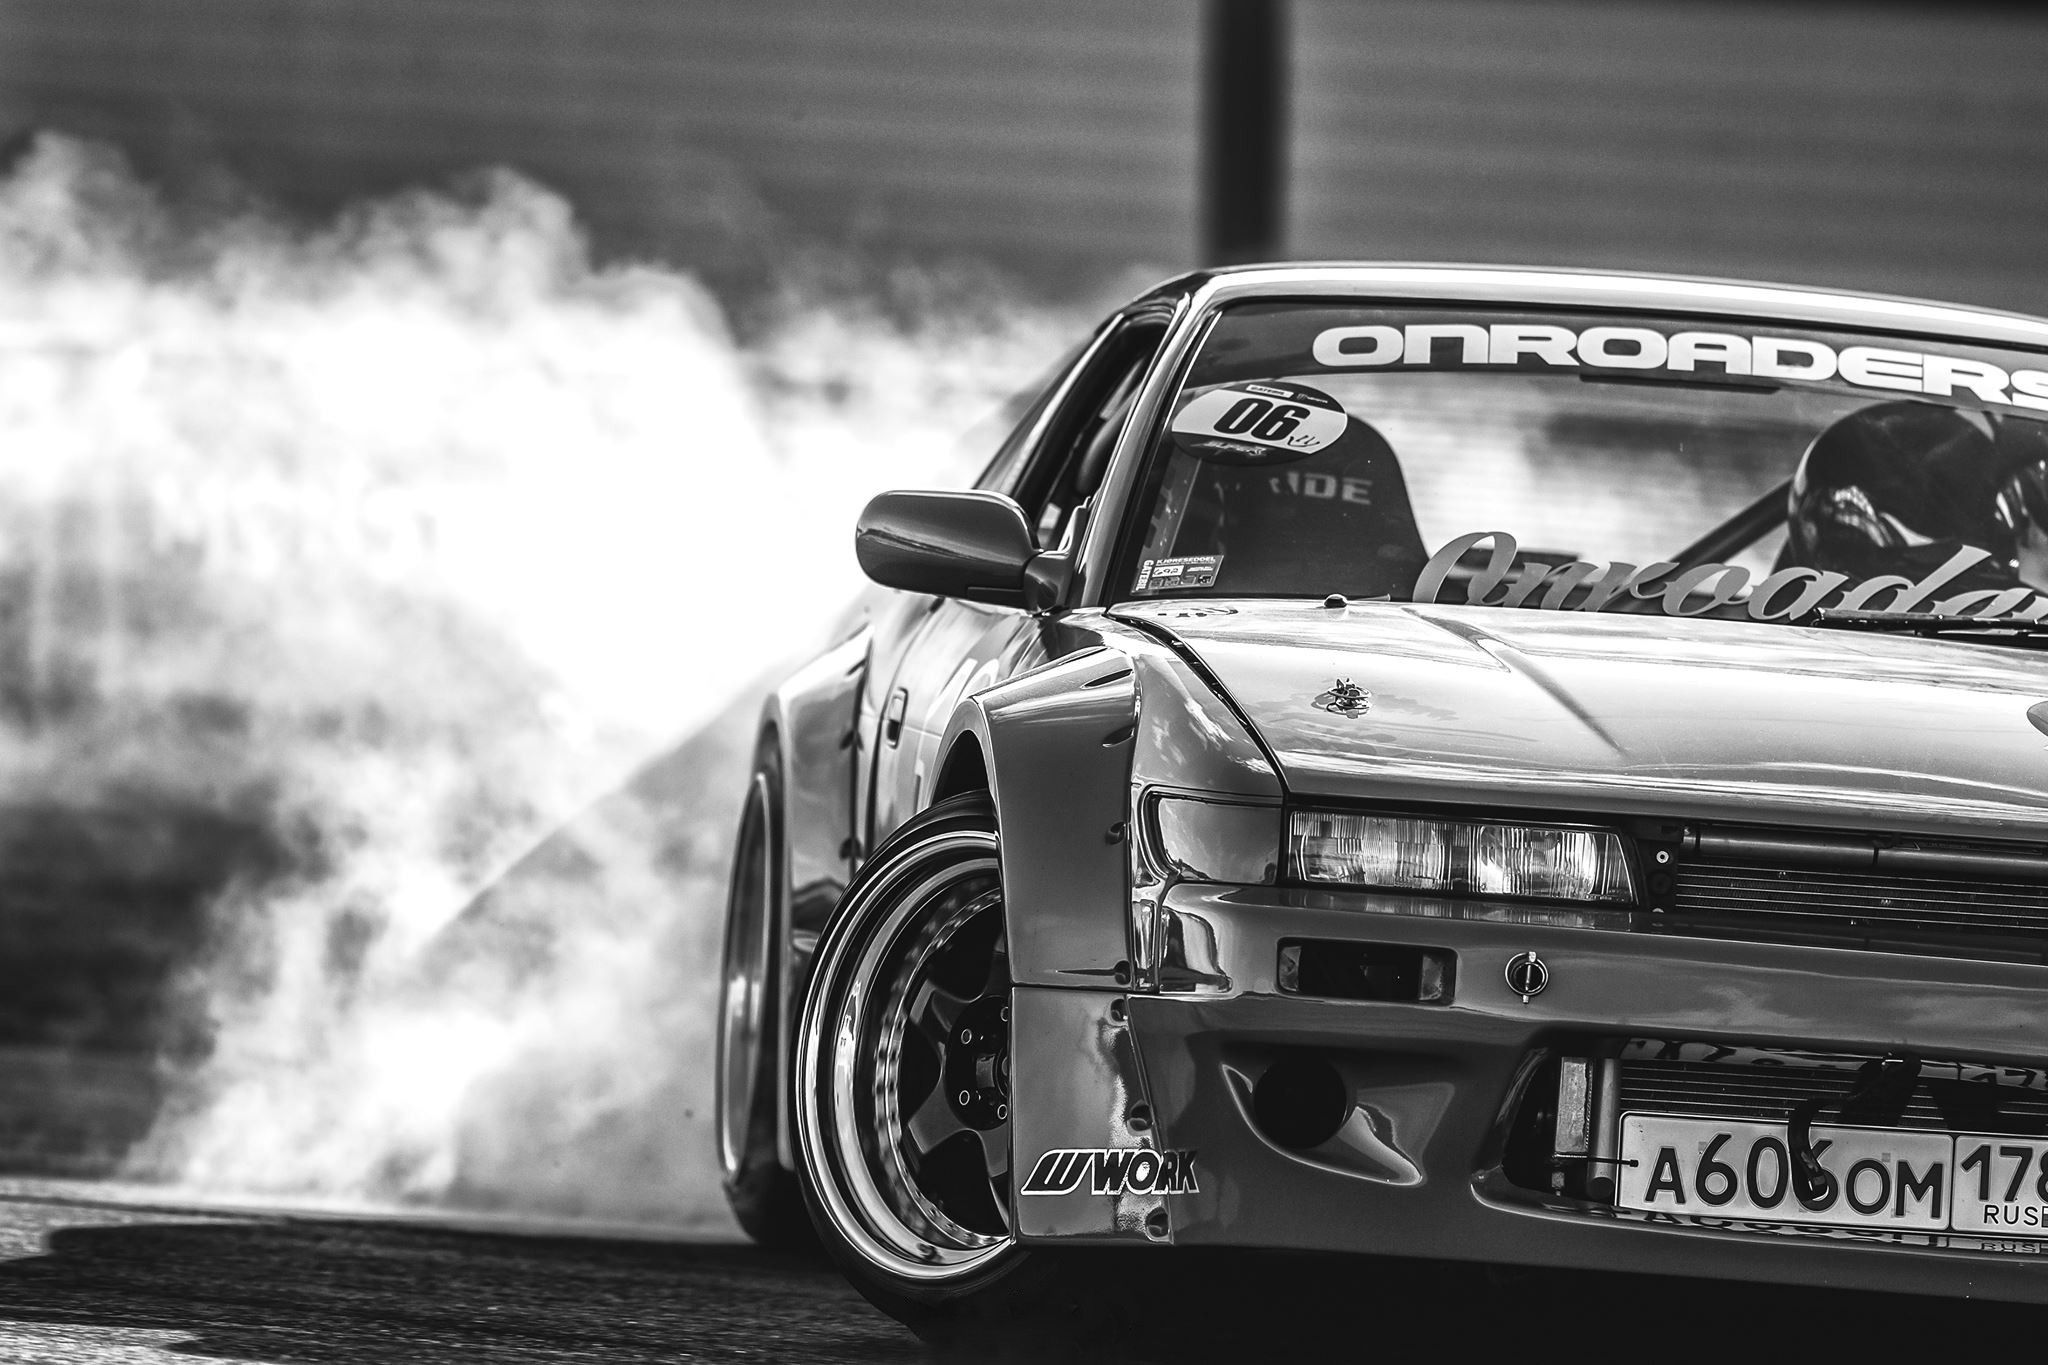 General Nissan Silvia S13 Silvia S13 Nissan Silvia S13 Nissan S13 Rocket  Bunny drift Drifting